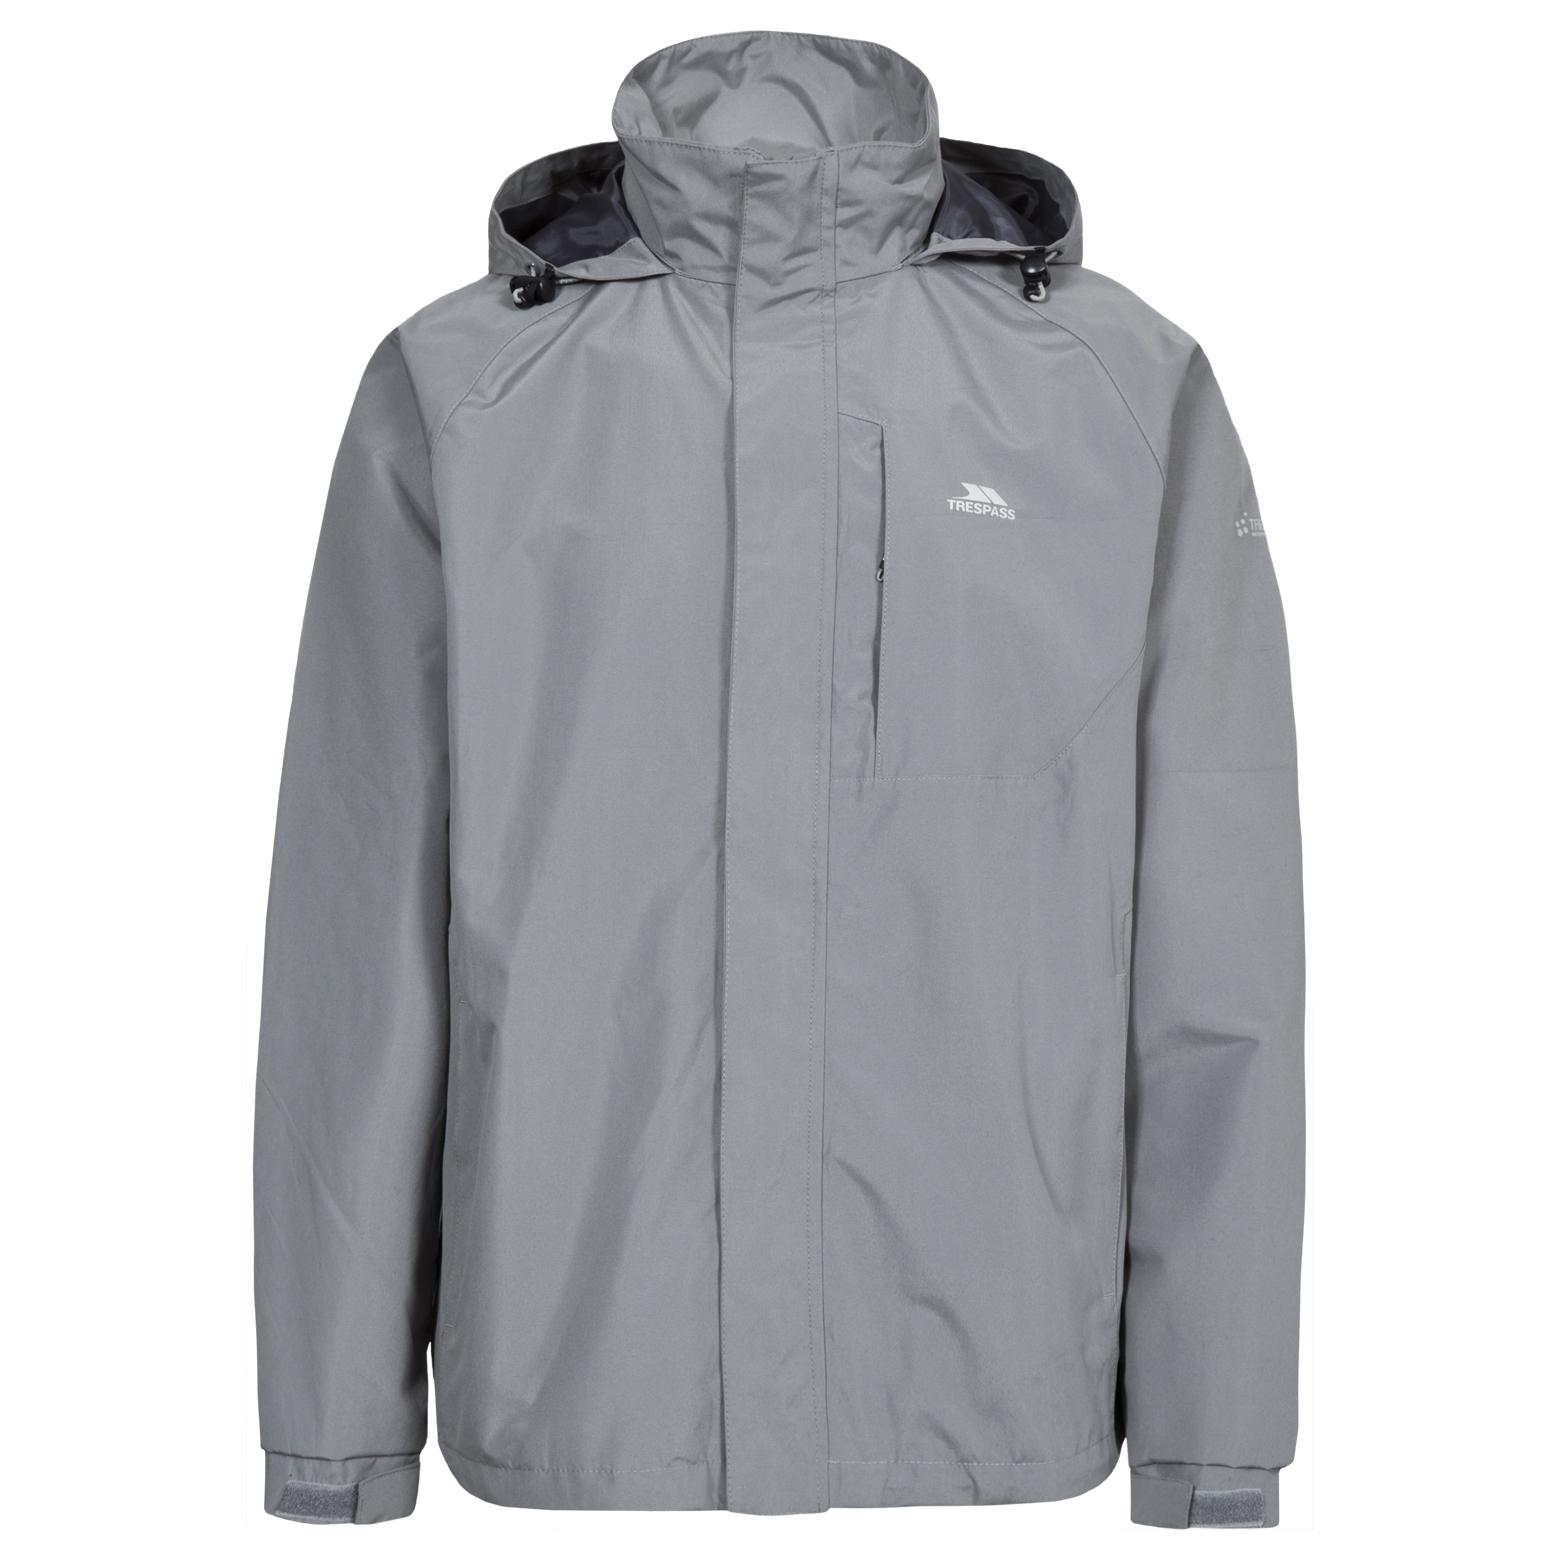 Trespass-Census-Mens-Waterproof-Hooded-Raincoat-Windproof-Jacket-with-Hood